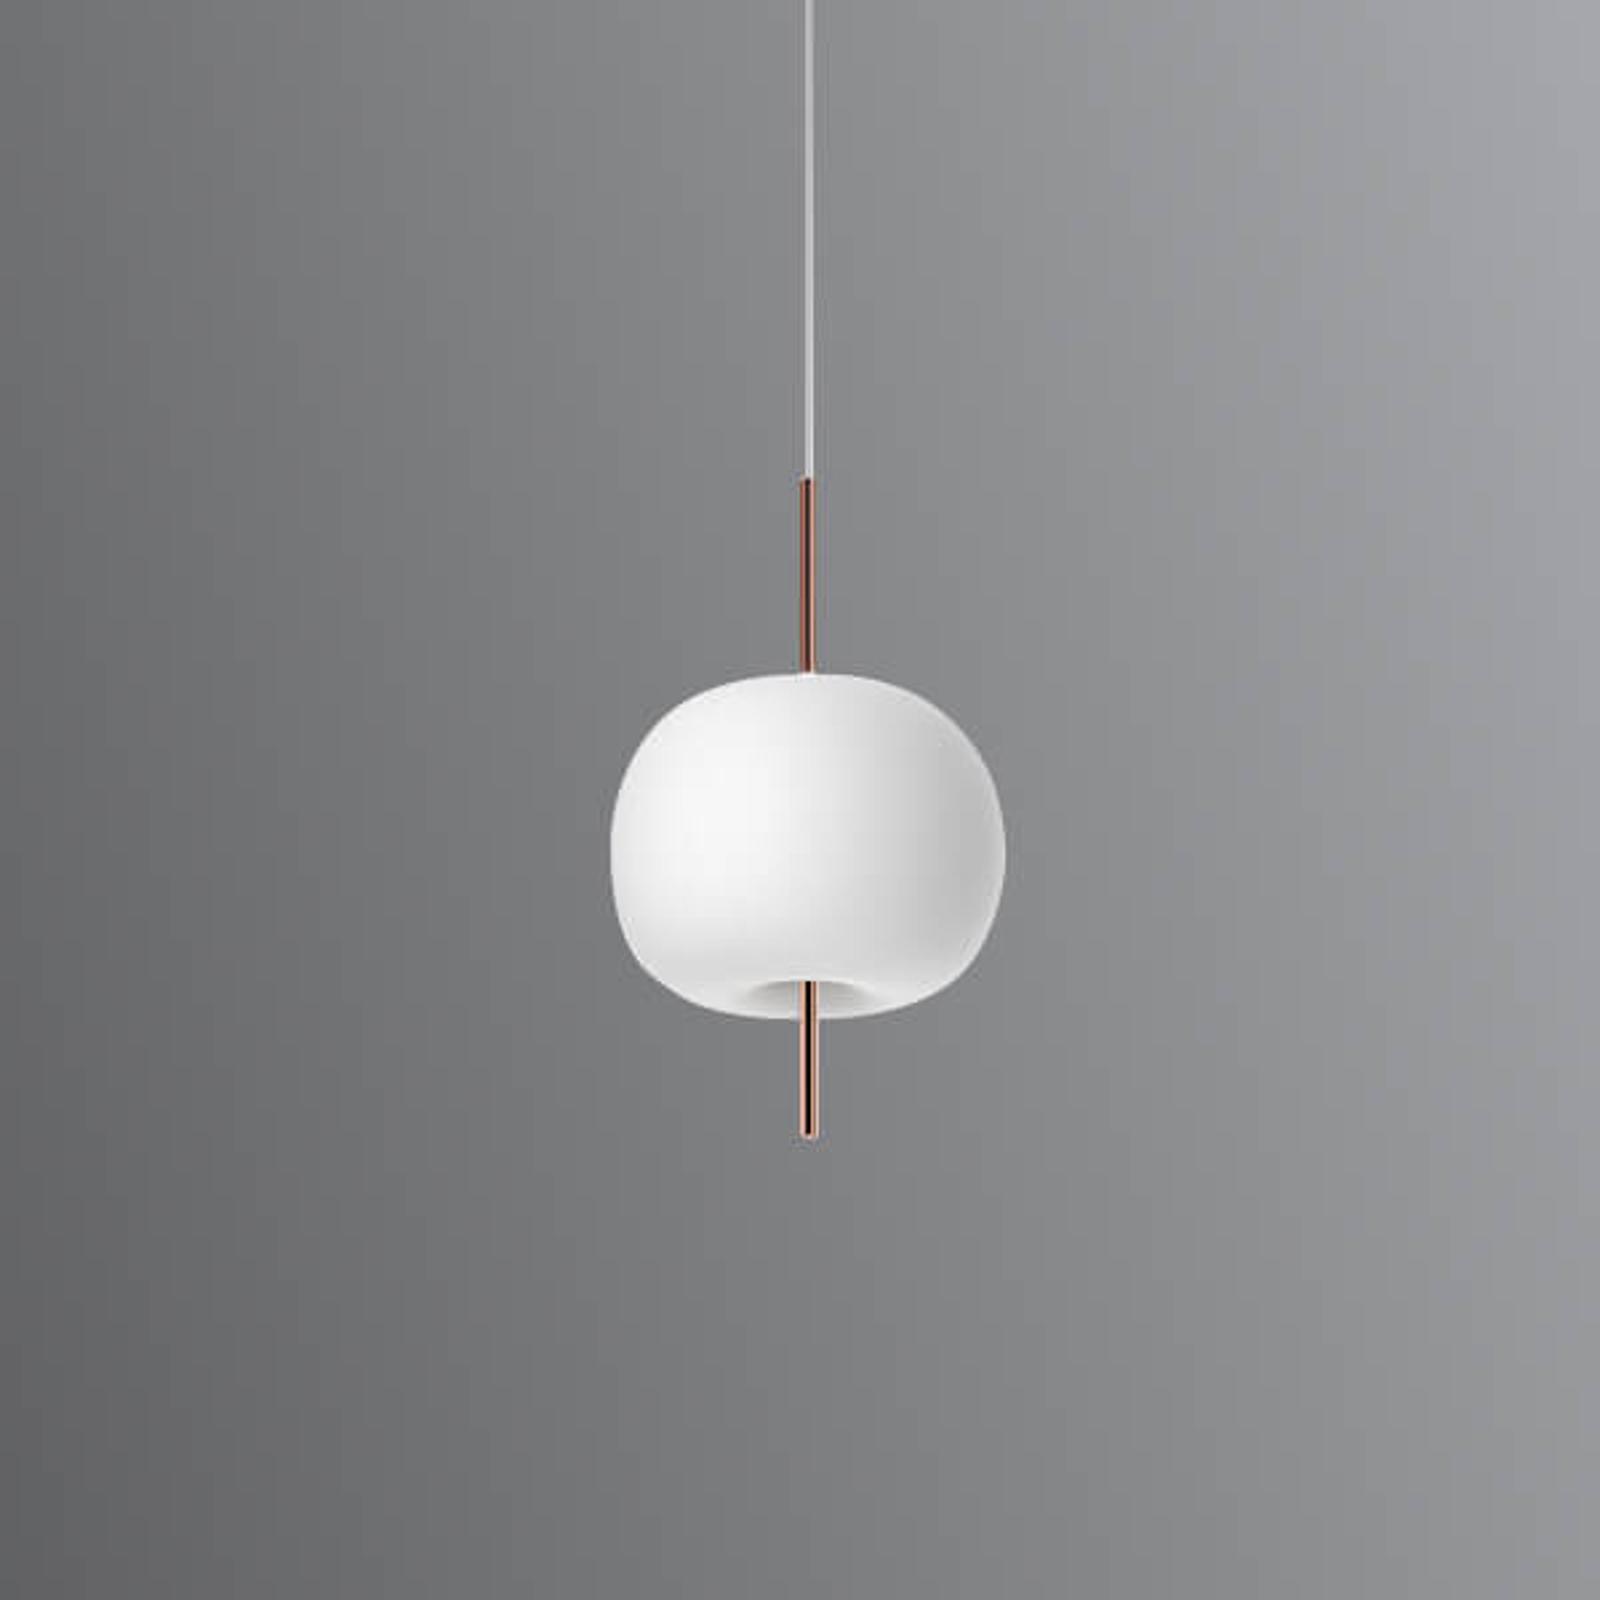 Lampada LED a sospensione Kushi,asta di rame 16